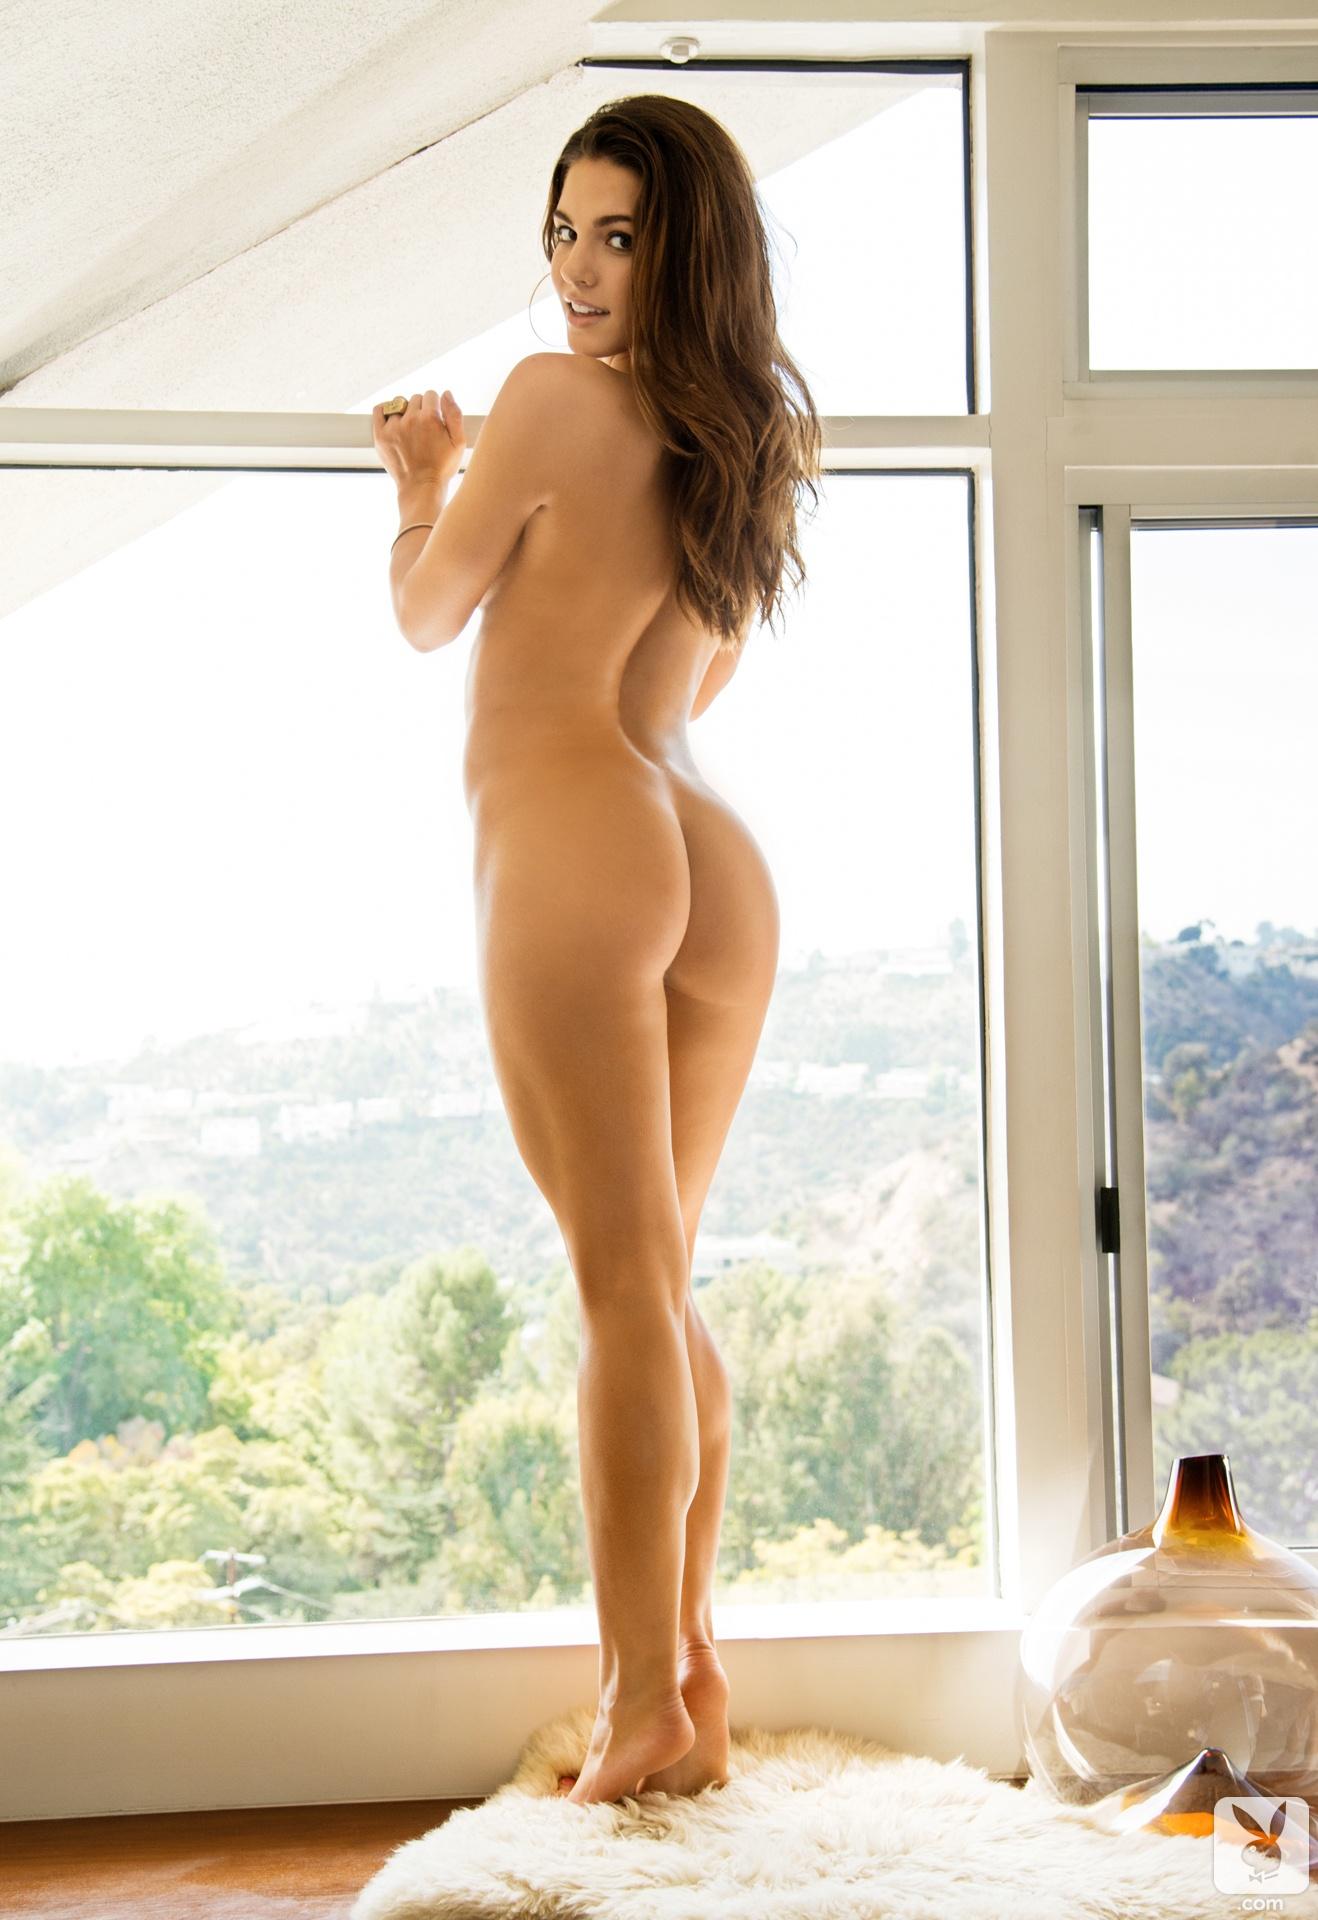 ashley tisdale posing nude jpg 422x640